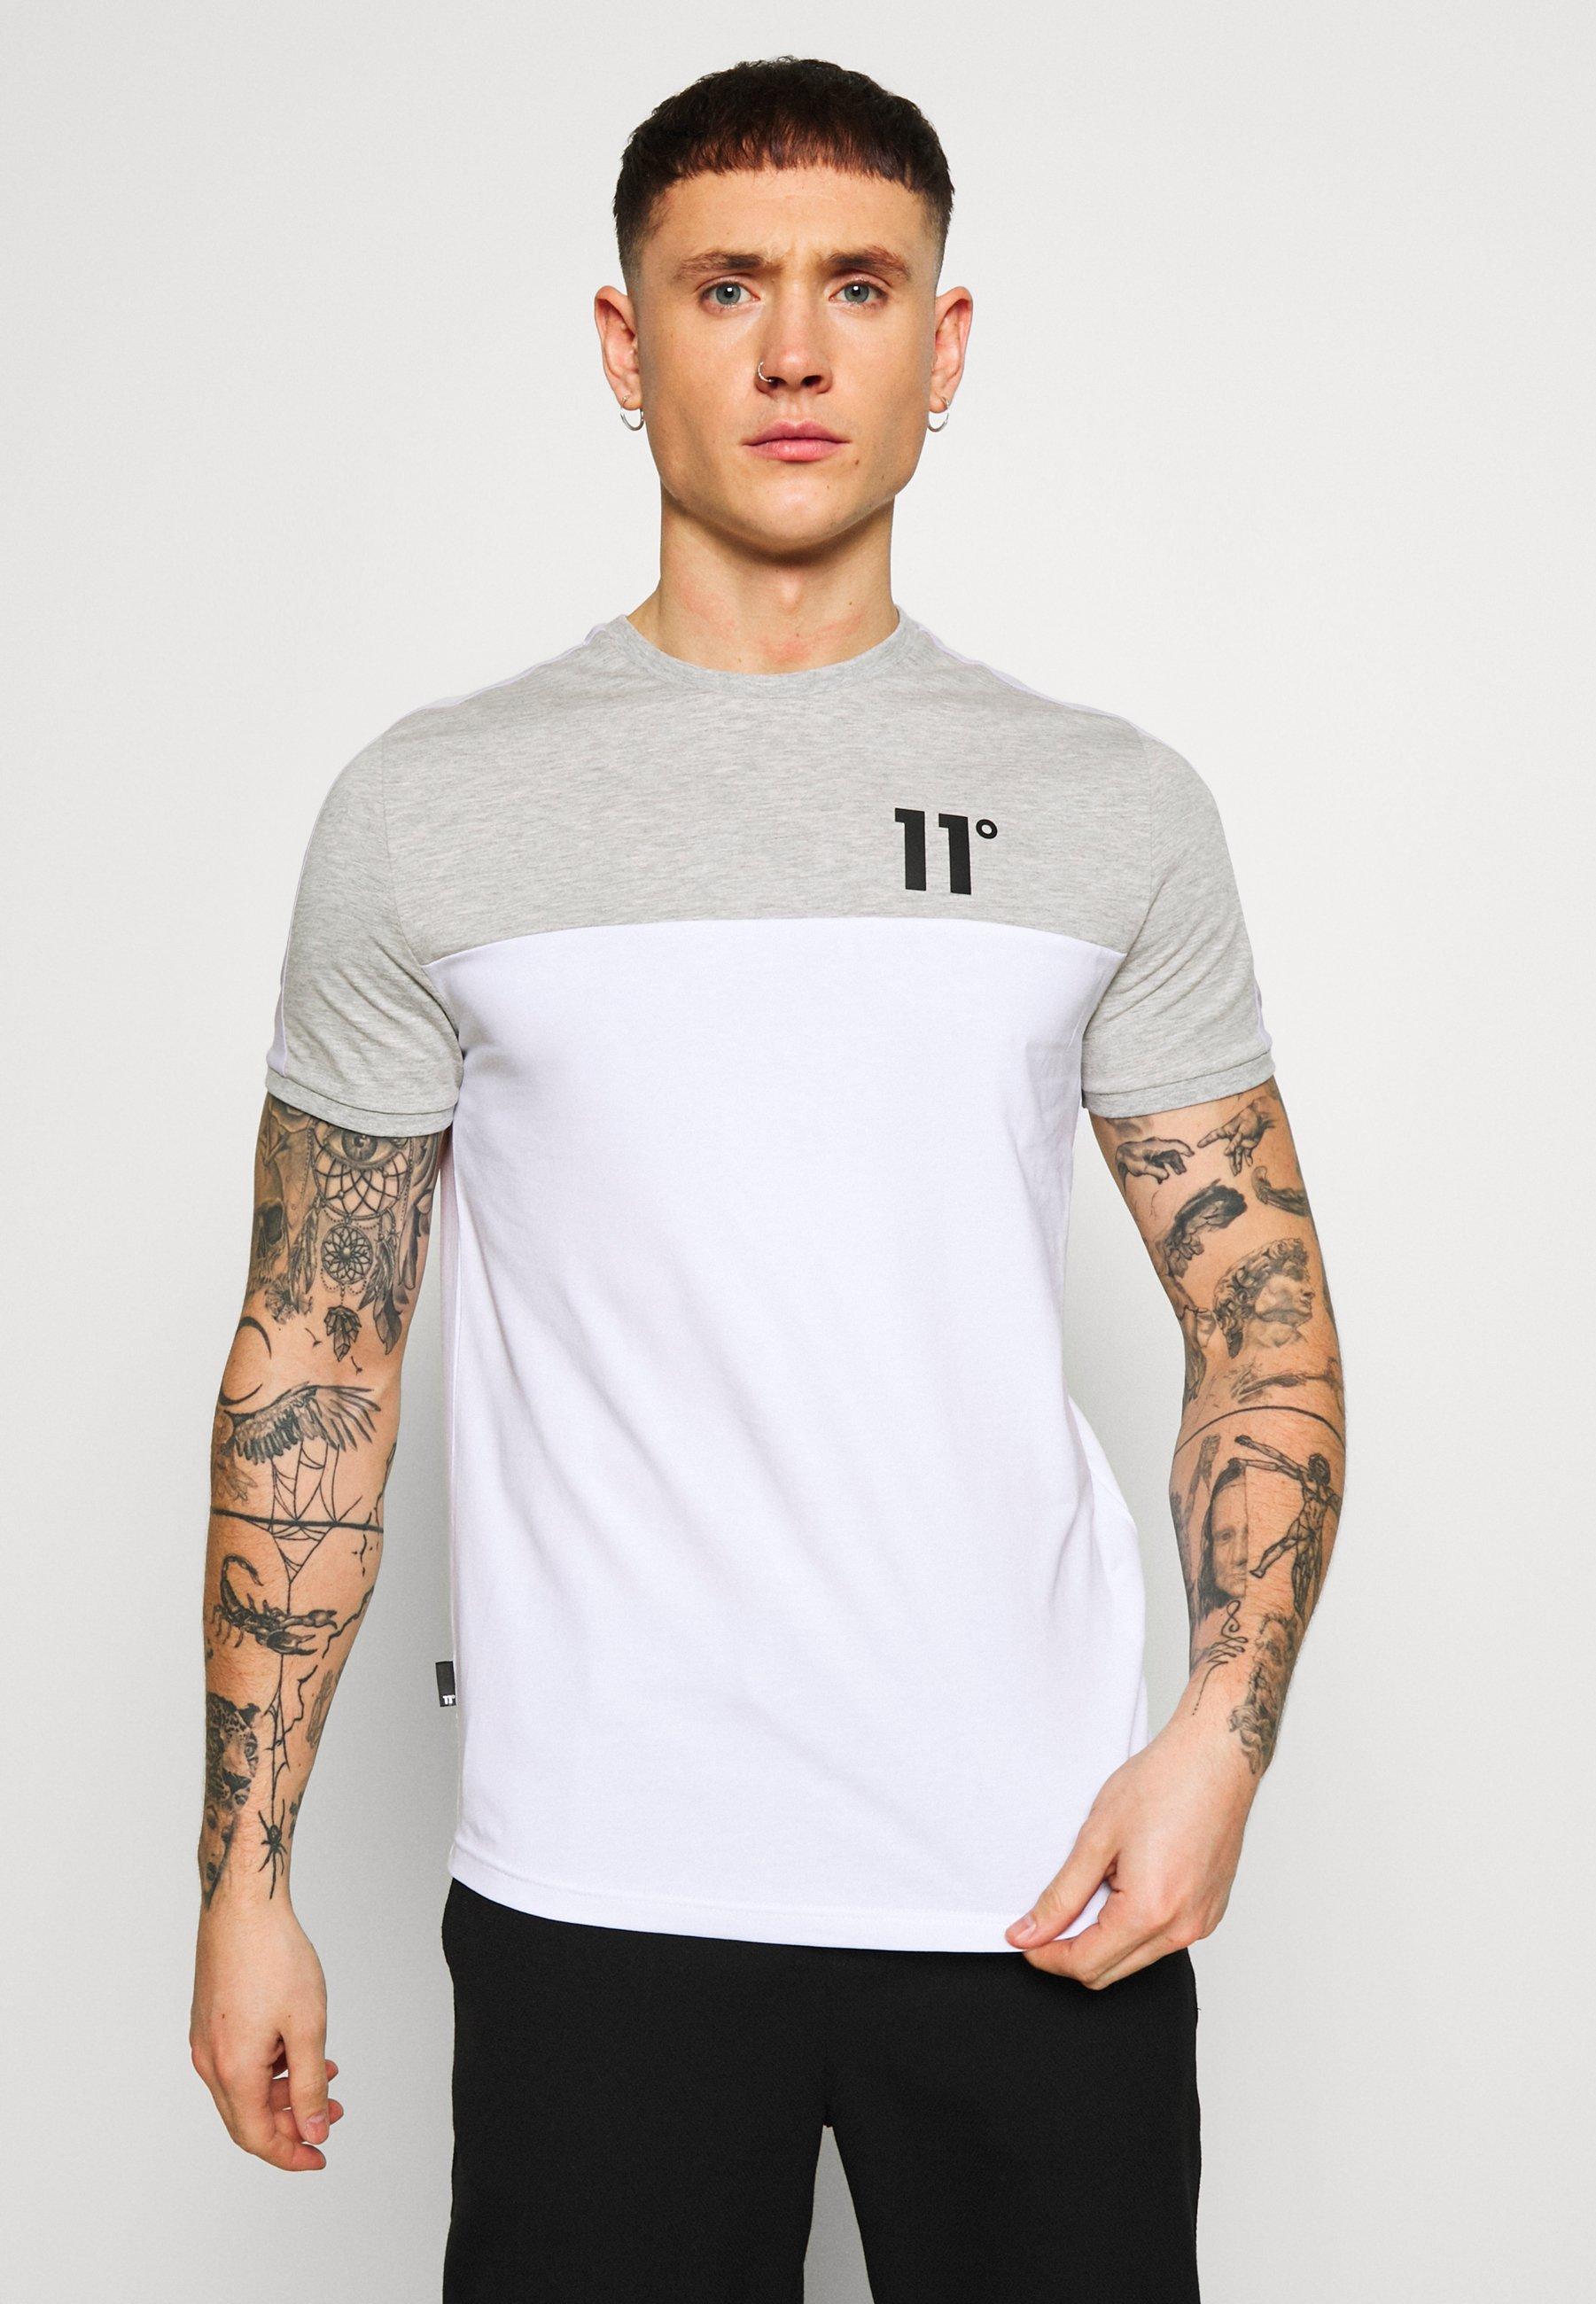 11 Degrees Panel Block - T-shirt Con Stampa White Light Grey Marl & Evening Haze Lilac